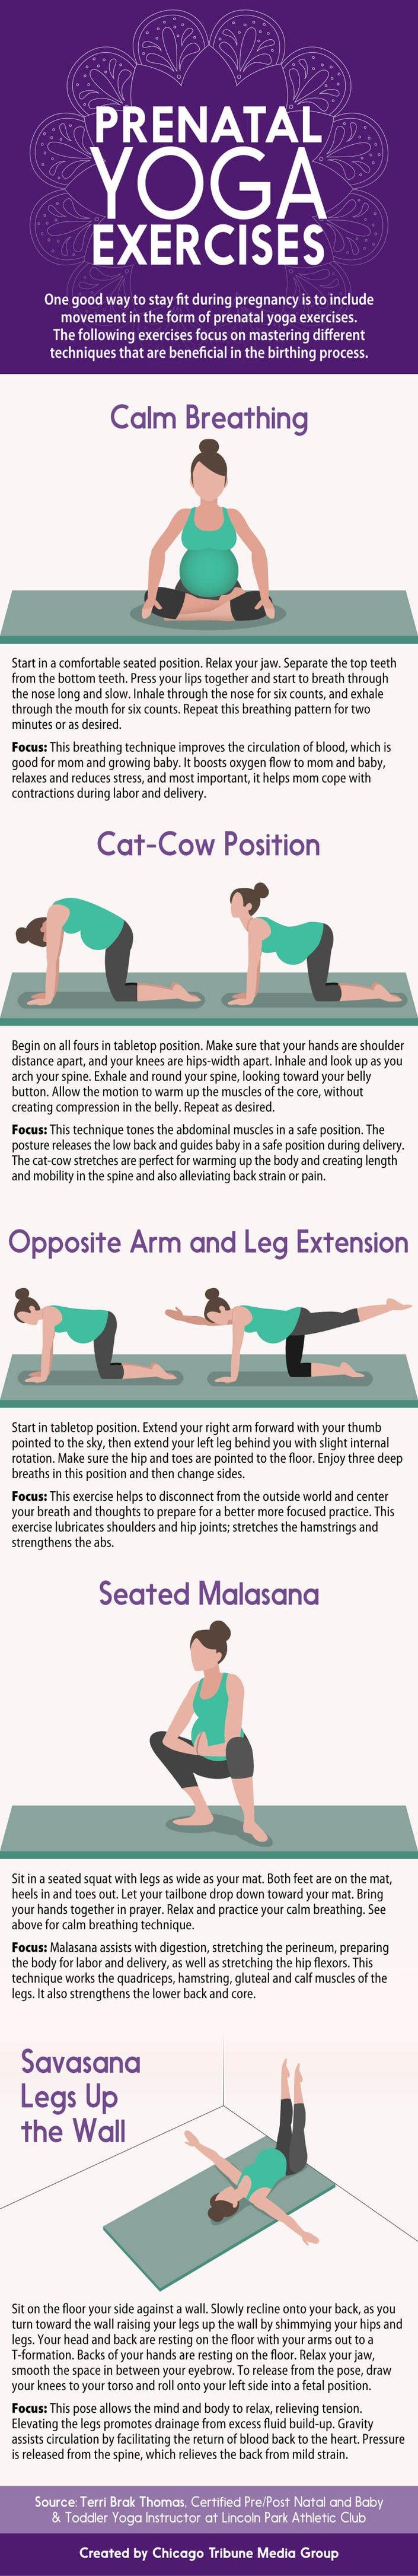 Top 5 Essential Prenatal Yoga Moves For Newbies